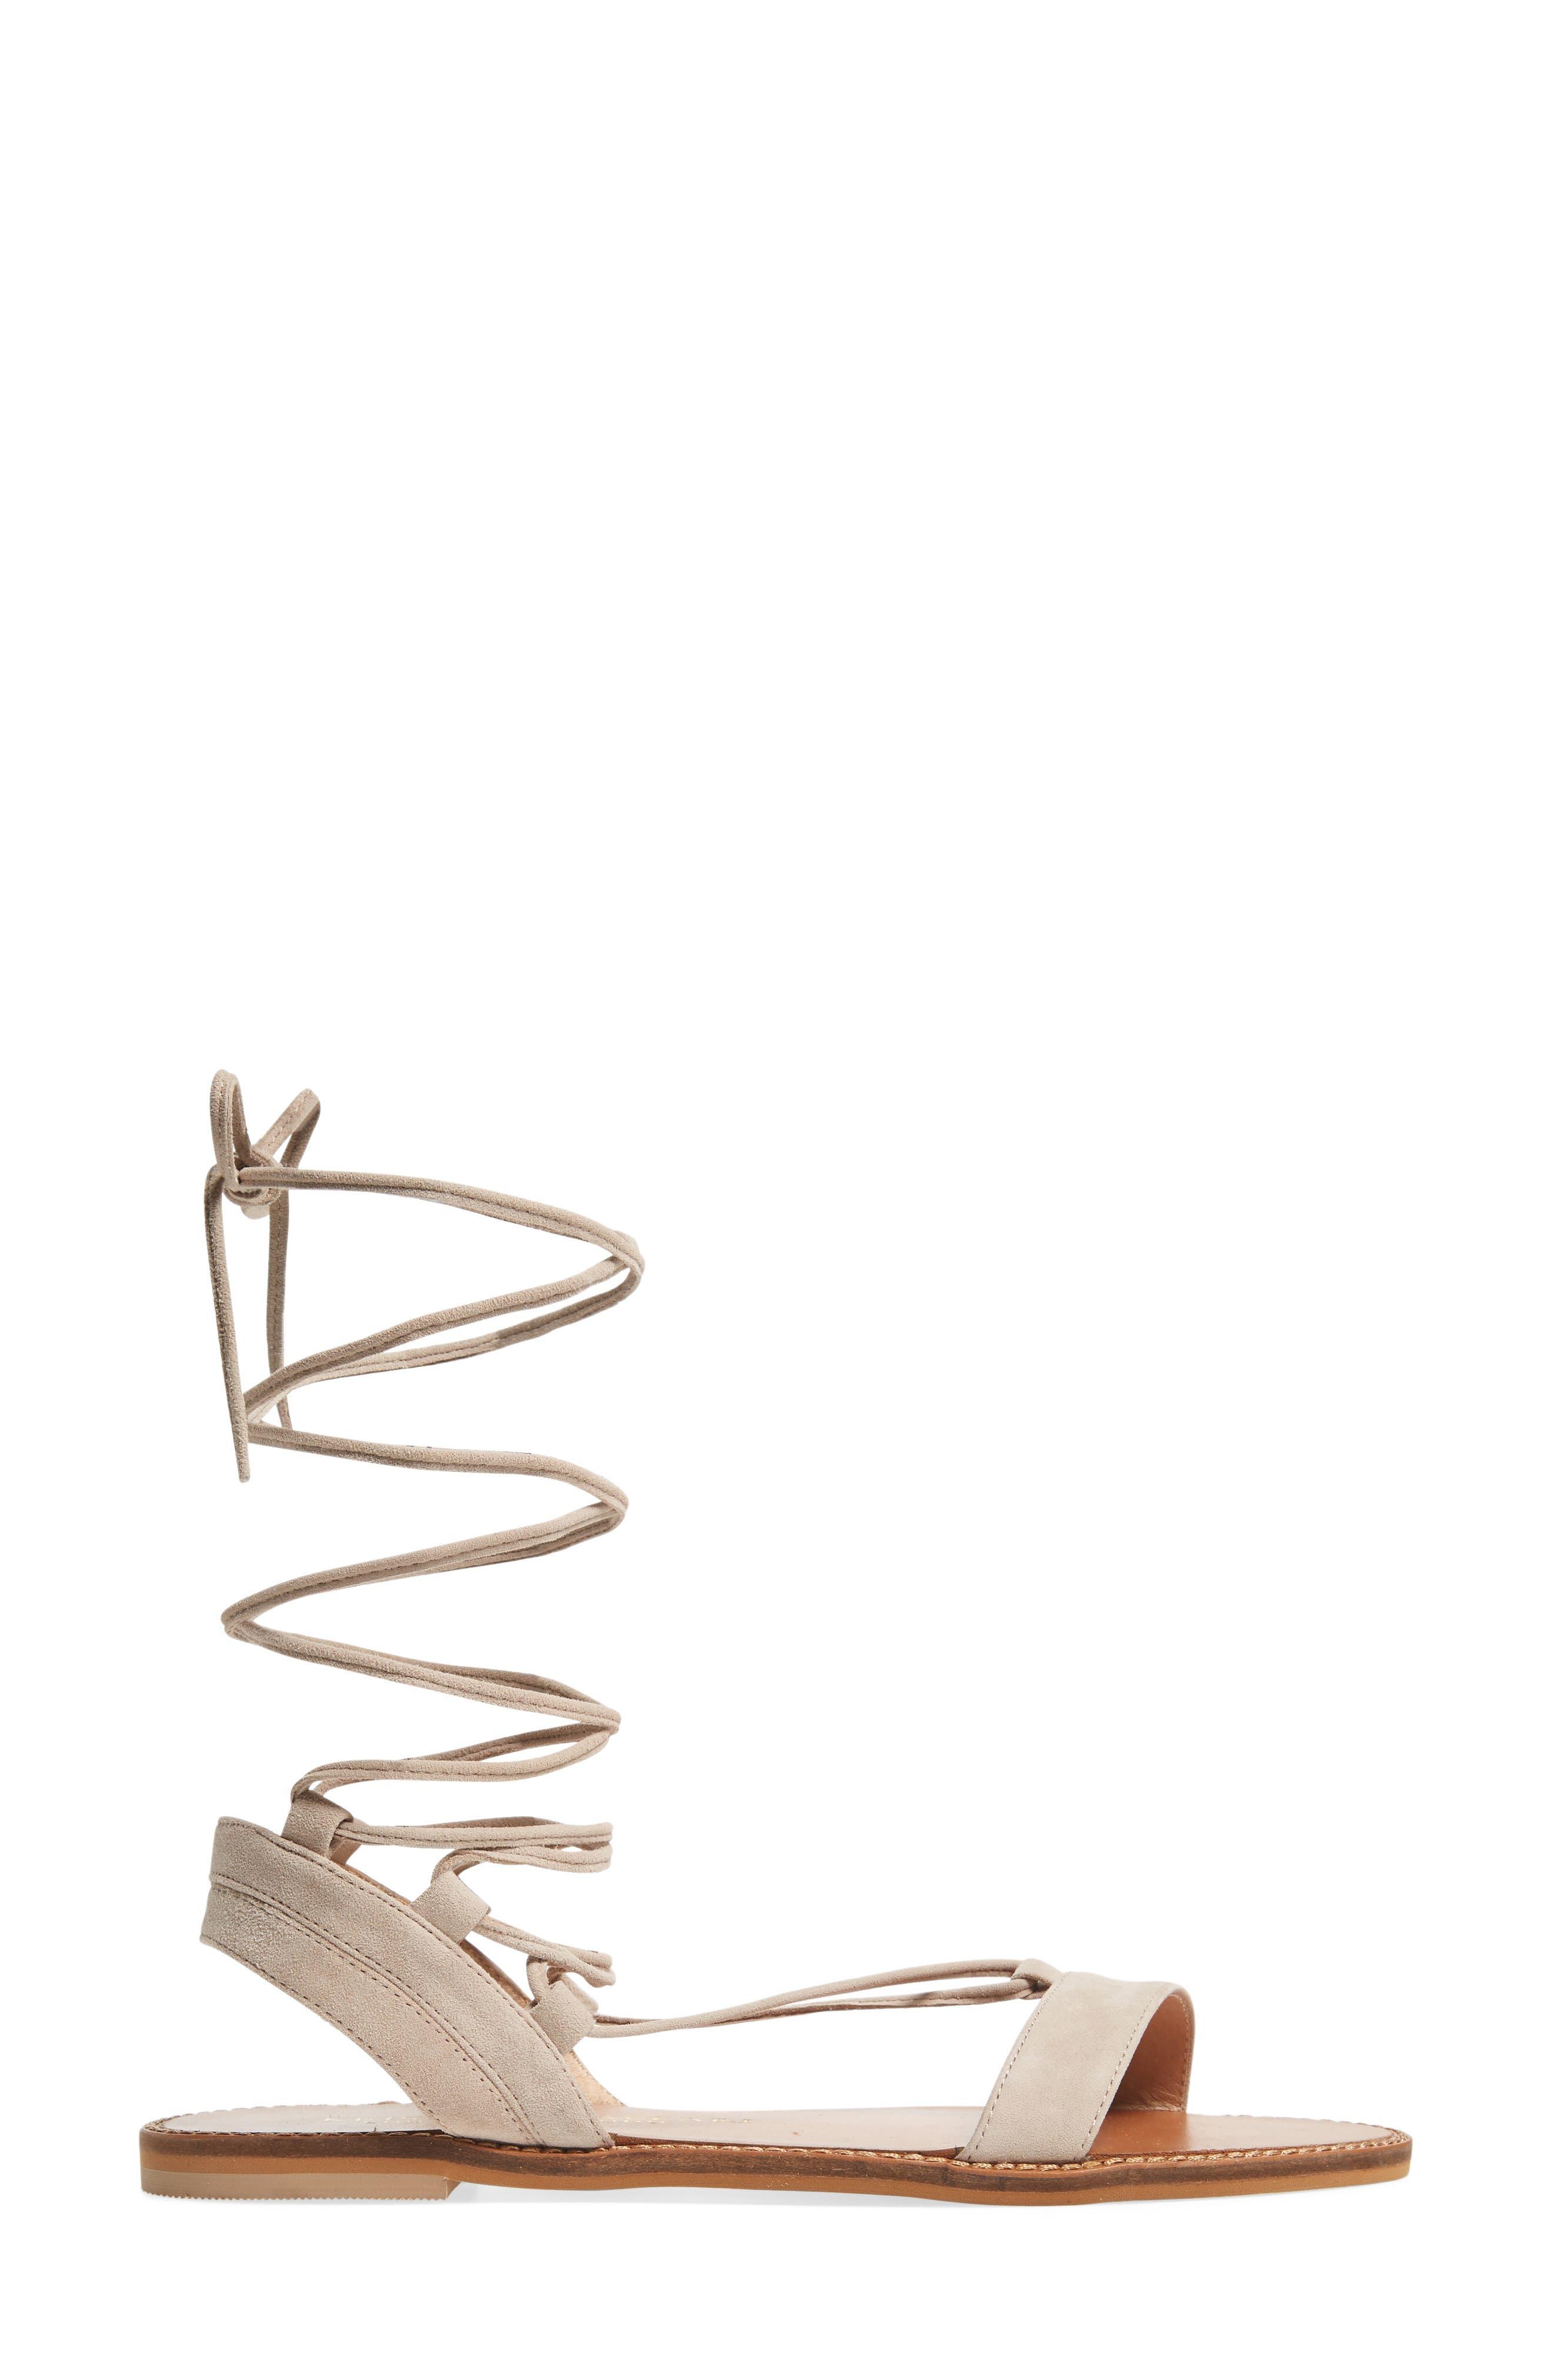 Brea Ankle Wrap Sandal,                             Alternate thumbnail 6, color,